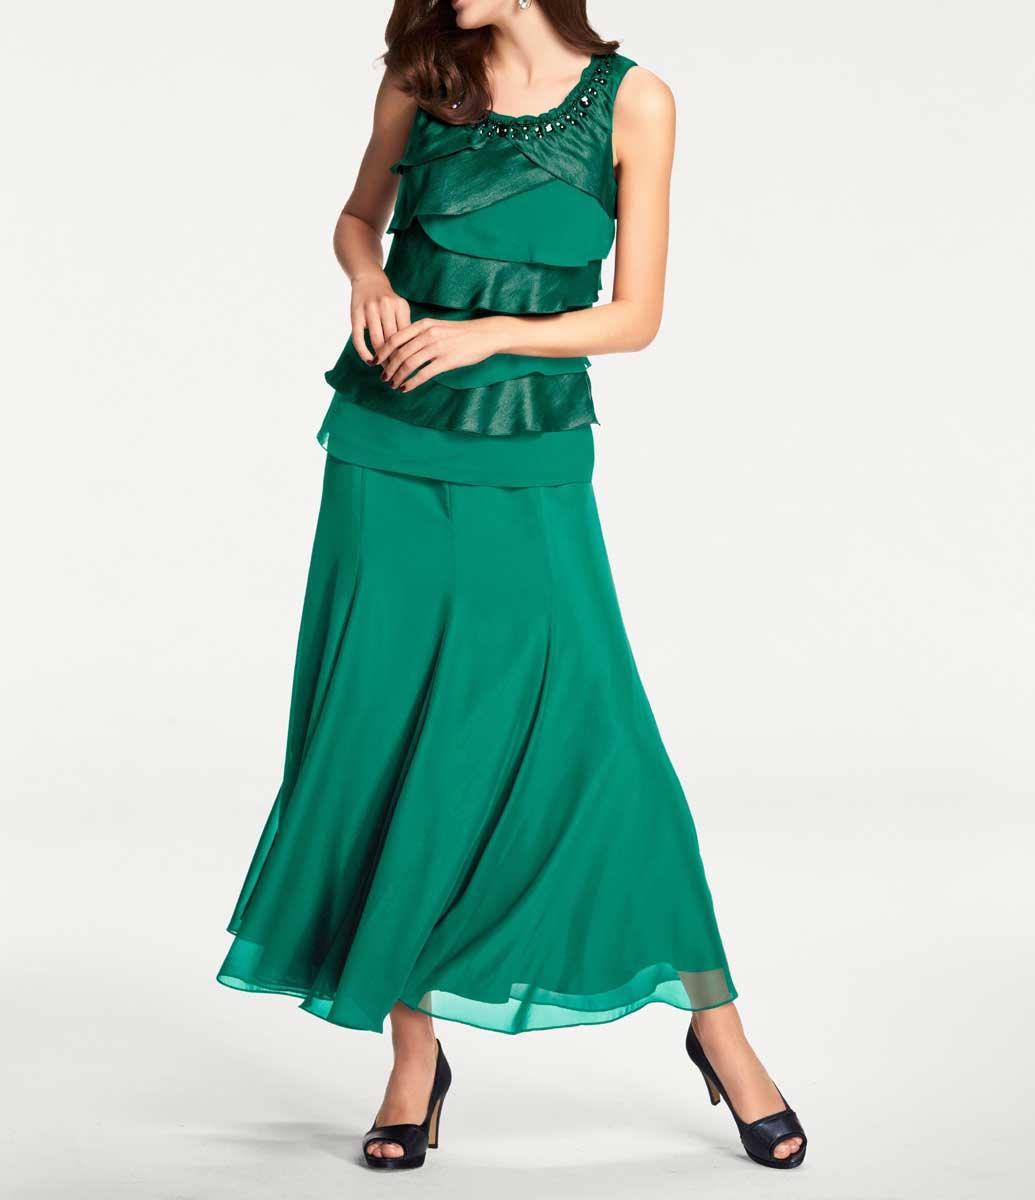 007.475 ASHLEY BROOKE Damen Designer-Maxirock aus Chiffon